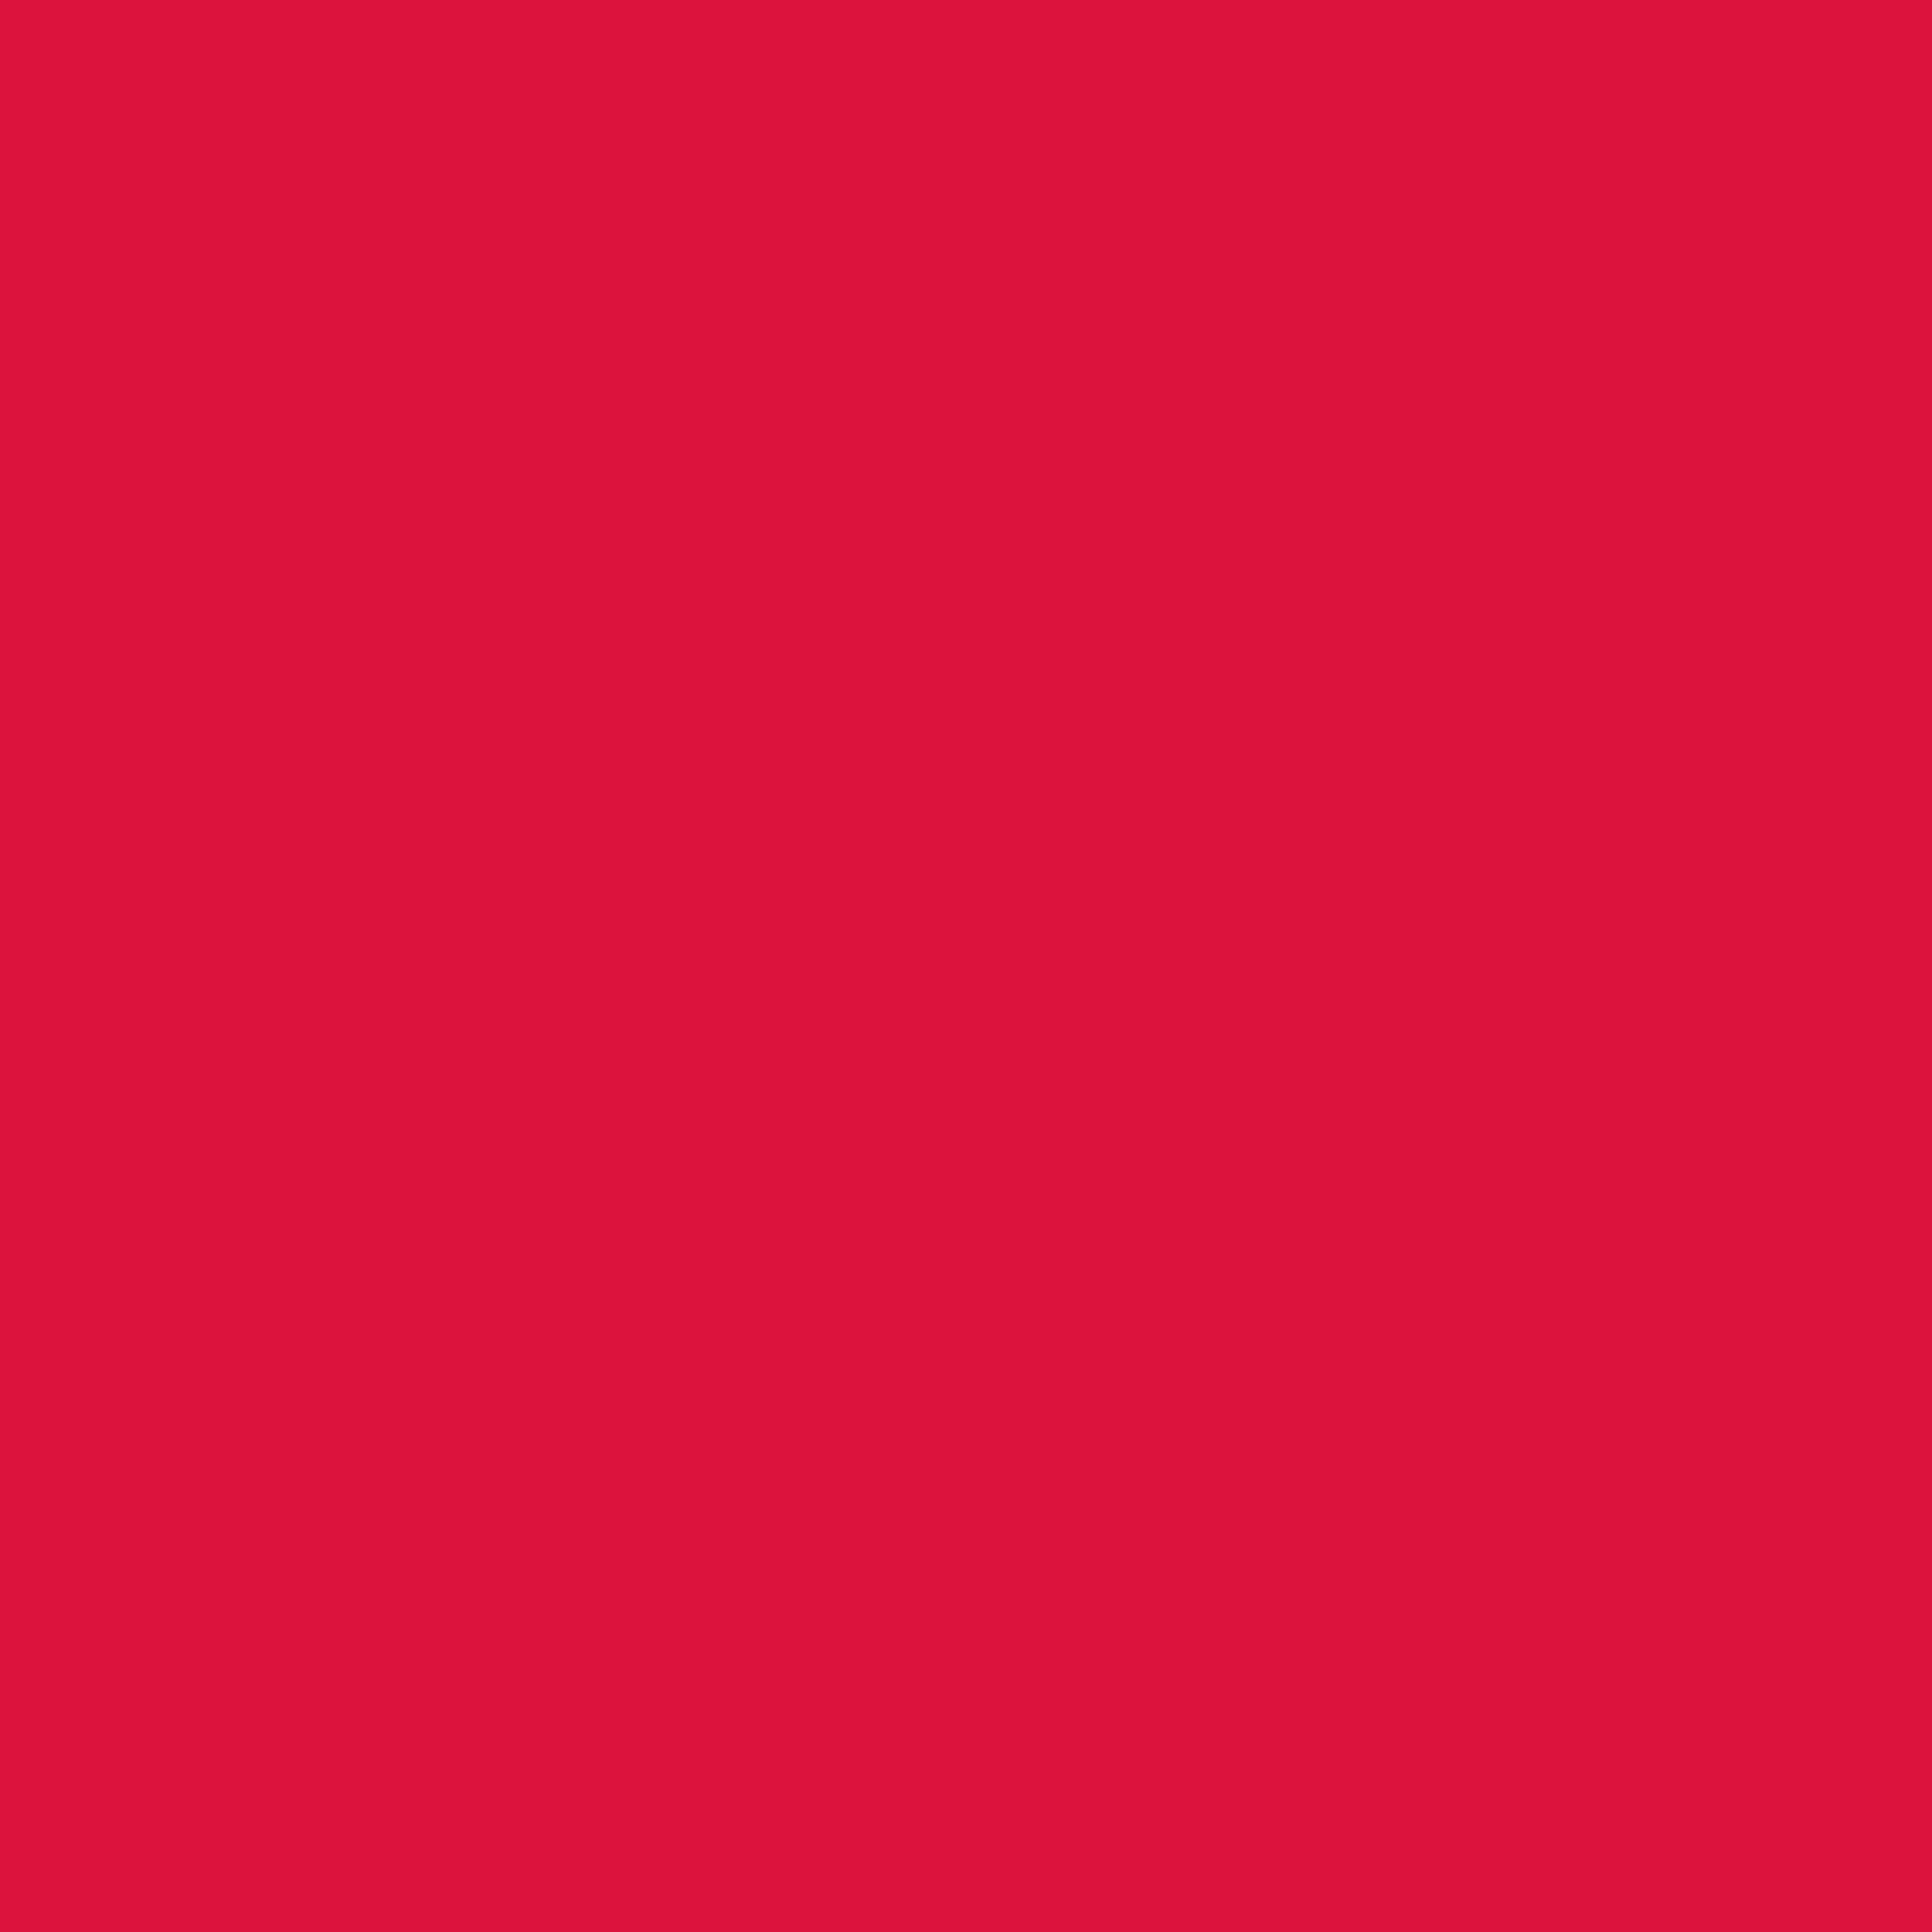 2732x2732 Crimson Solid Color Background